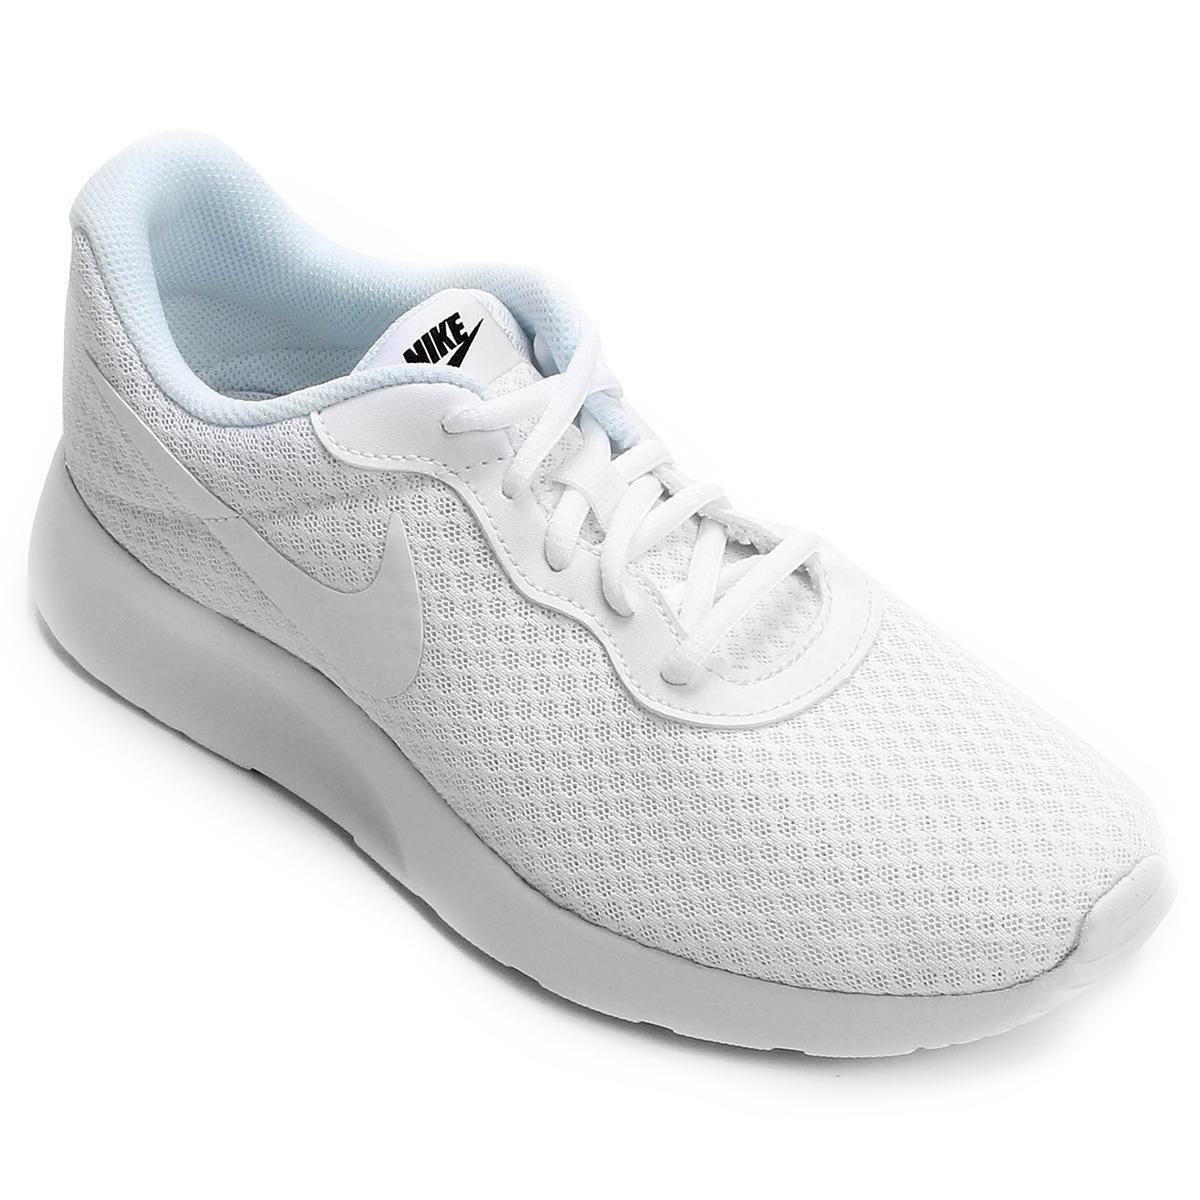 2a3cd5be7 Tênis Nike Tanjun Masculino - Branco e Preto - Compre Agora